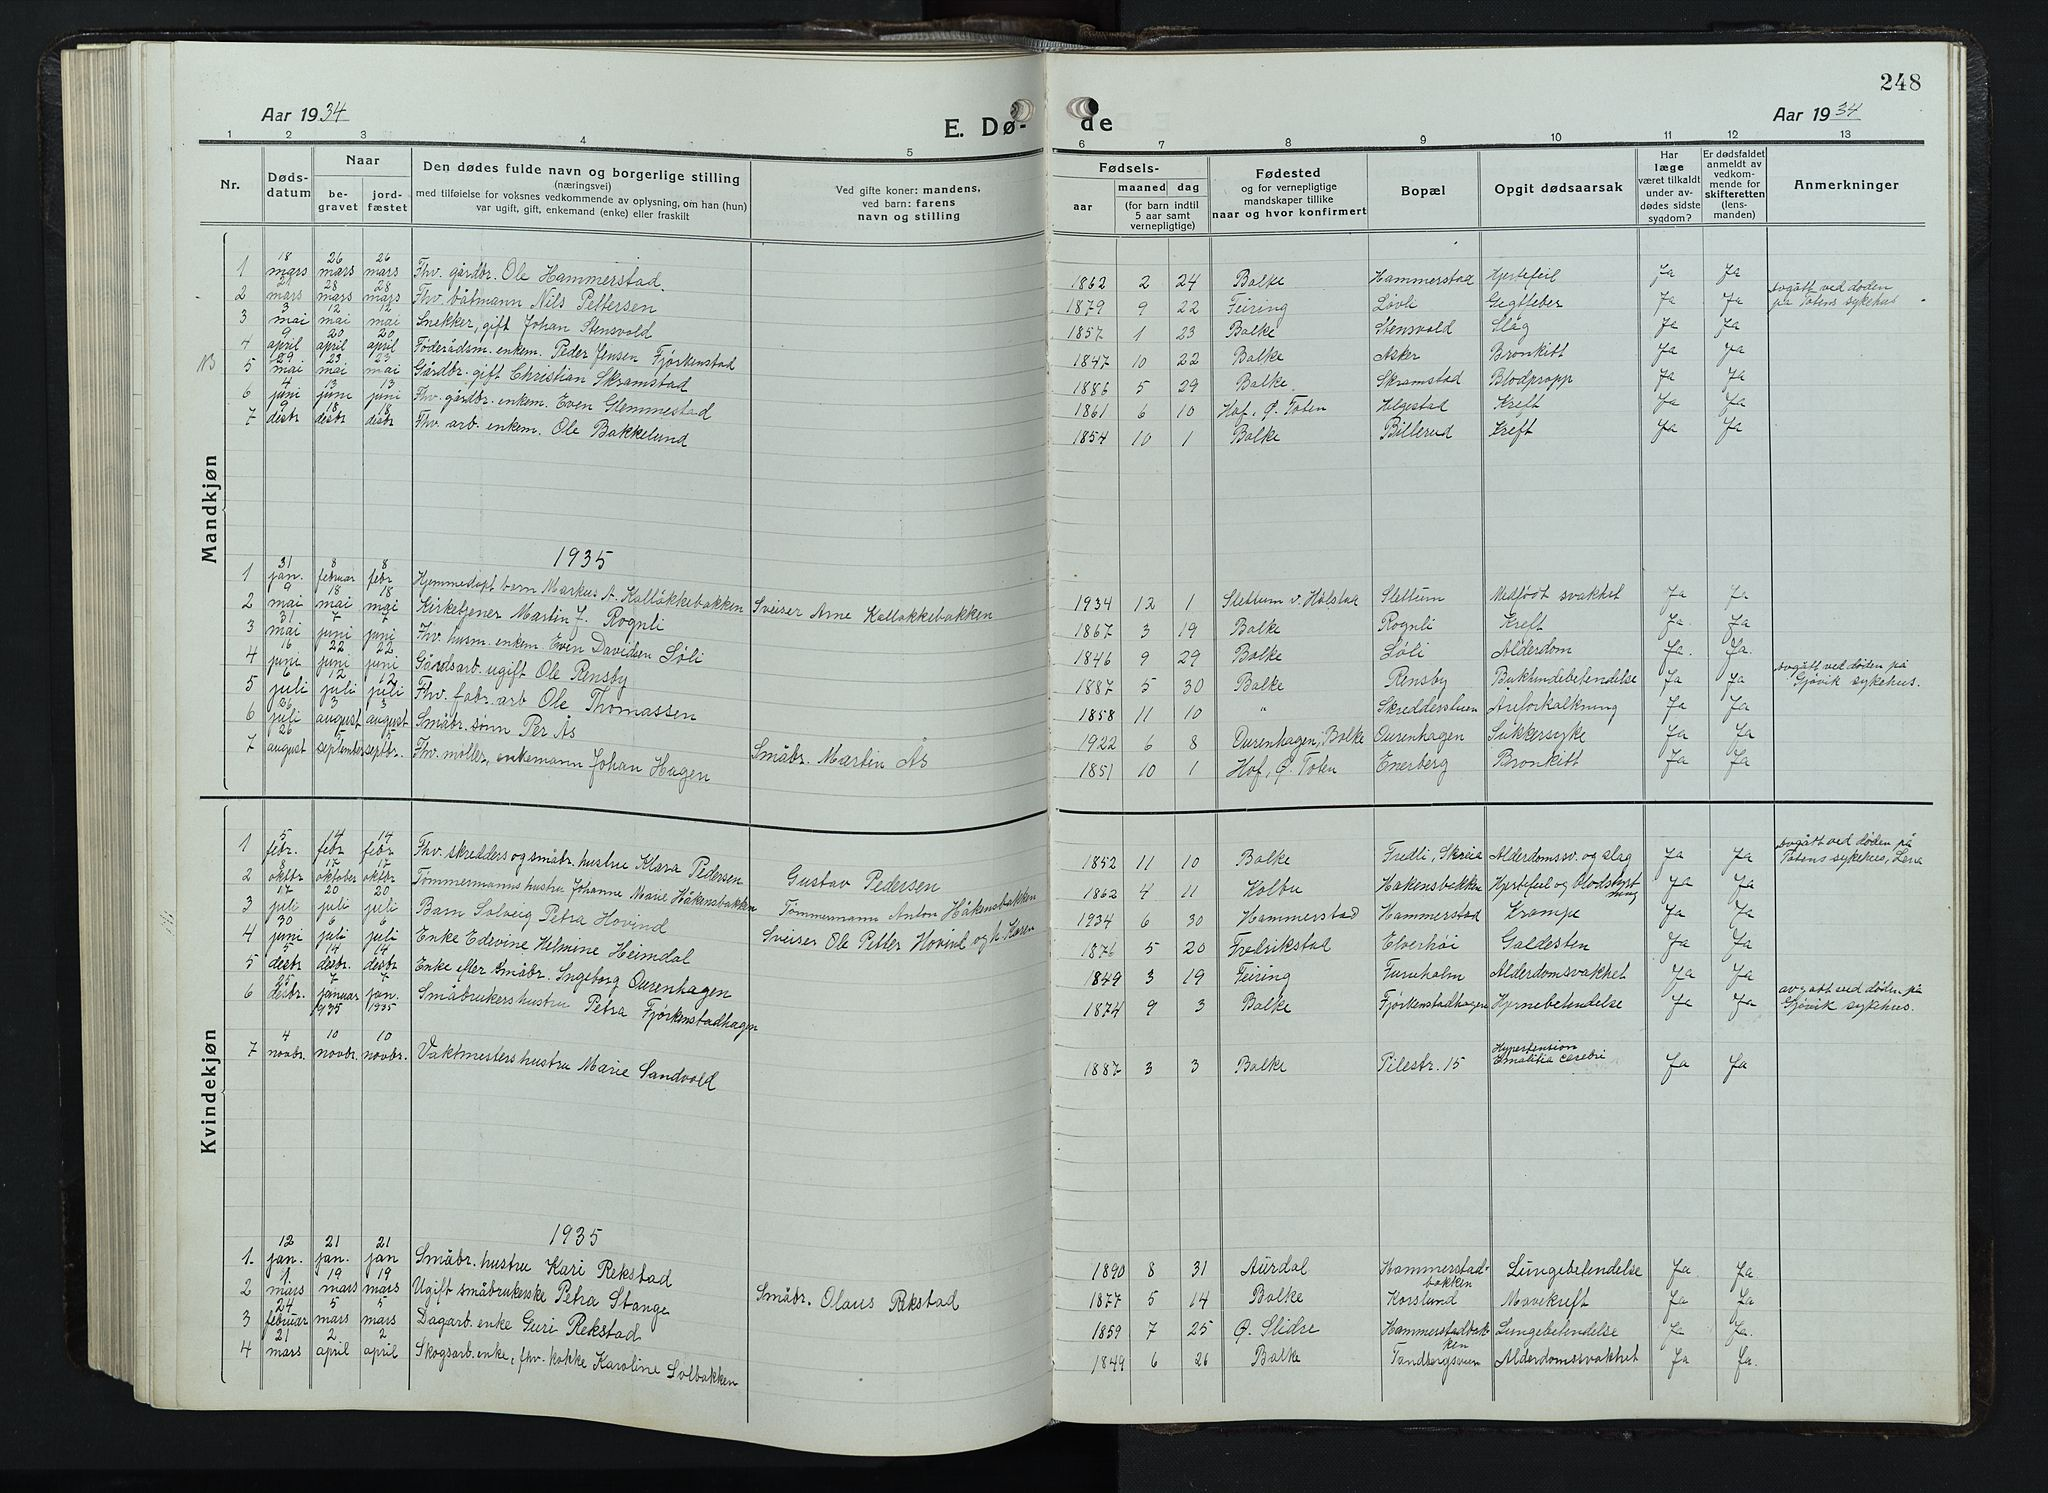 SAH, Balke prestekontor, Klokkerbok nr. 1, 1920-1955, s. 248